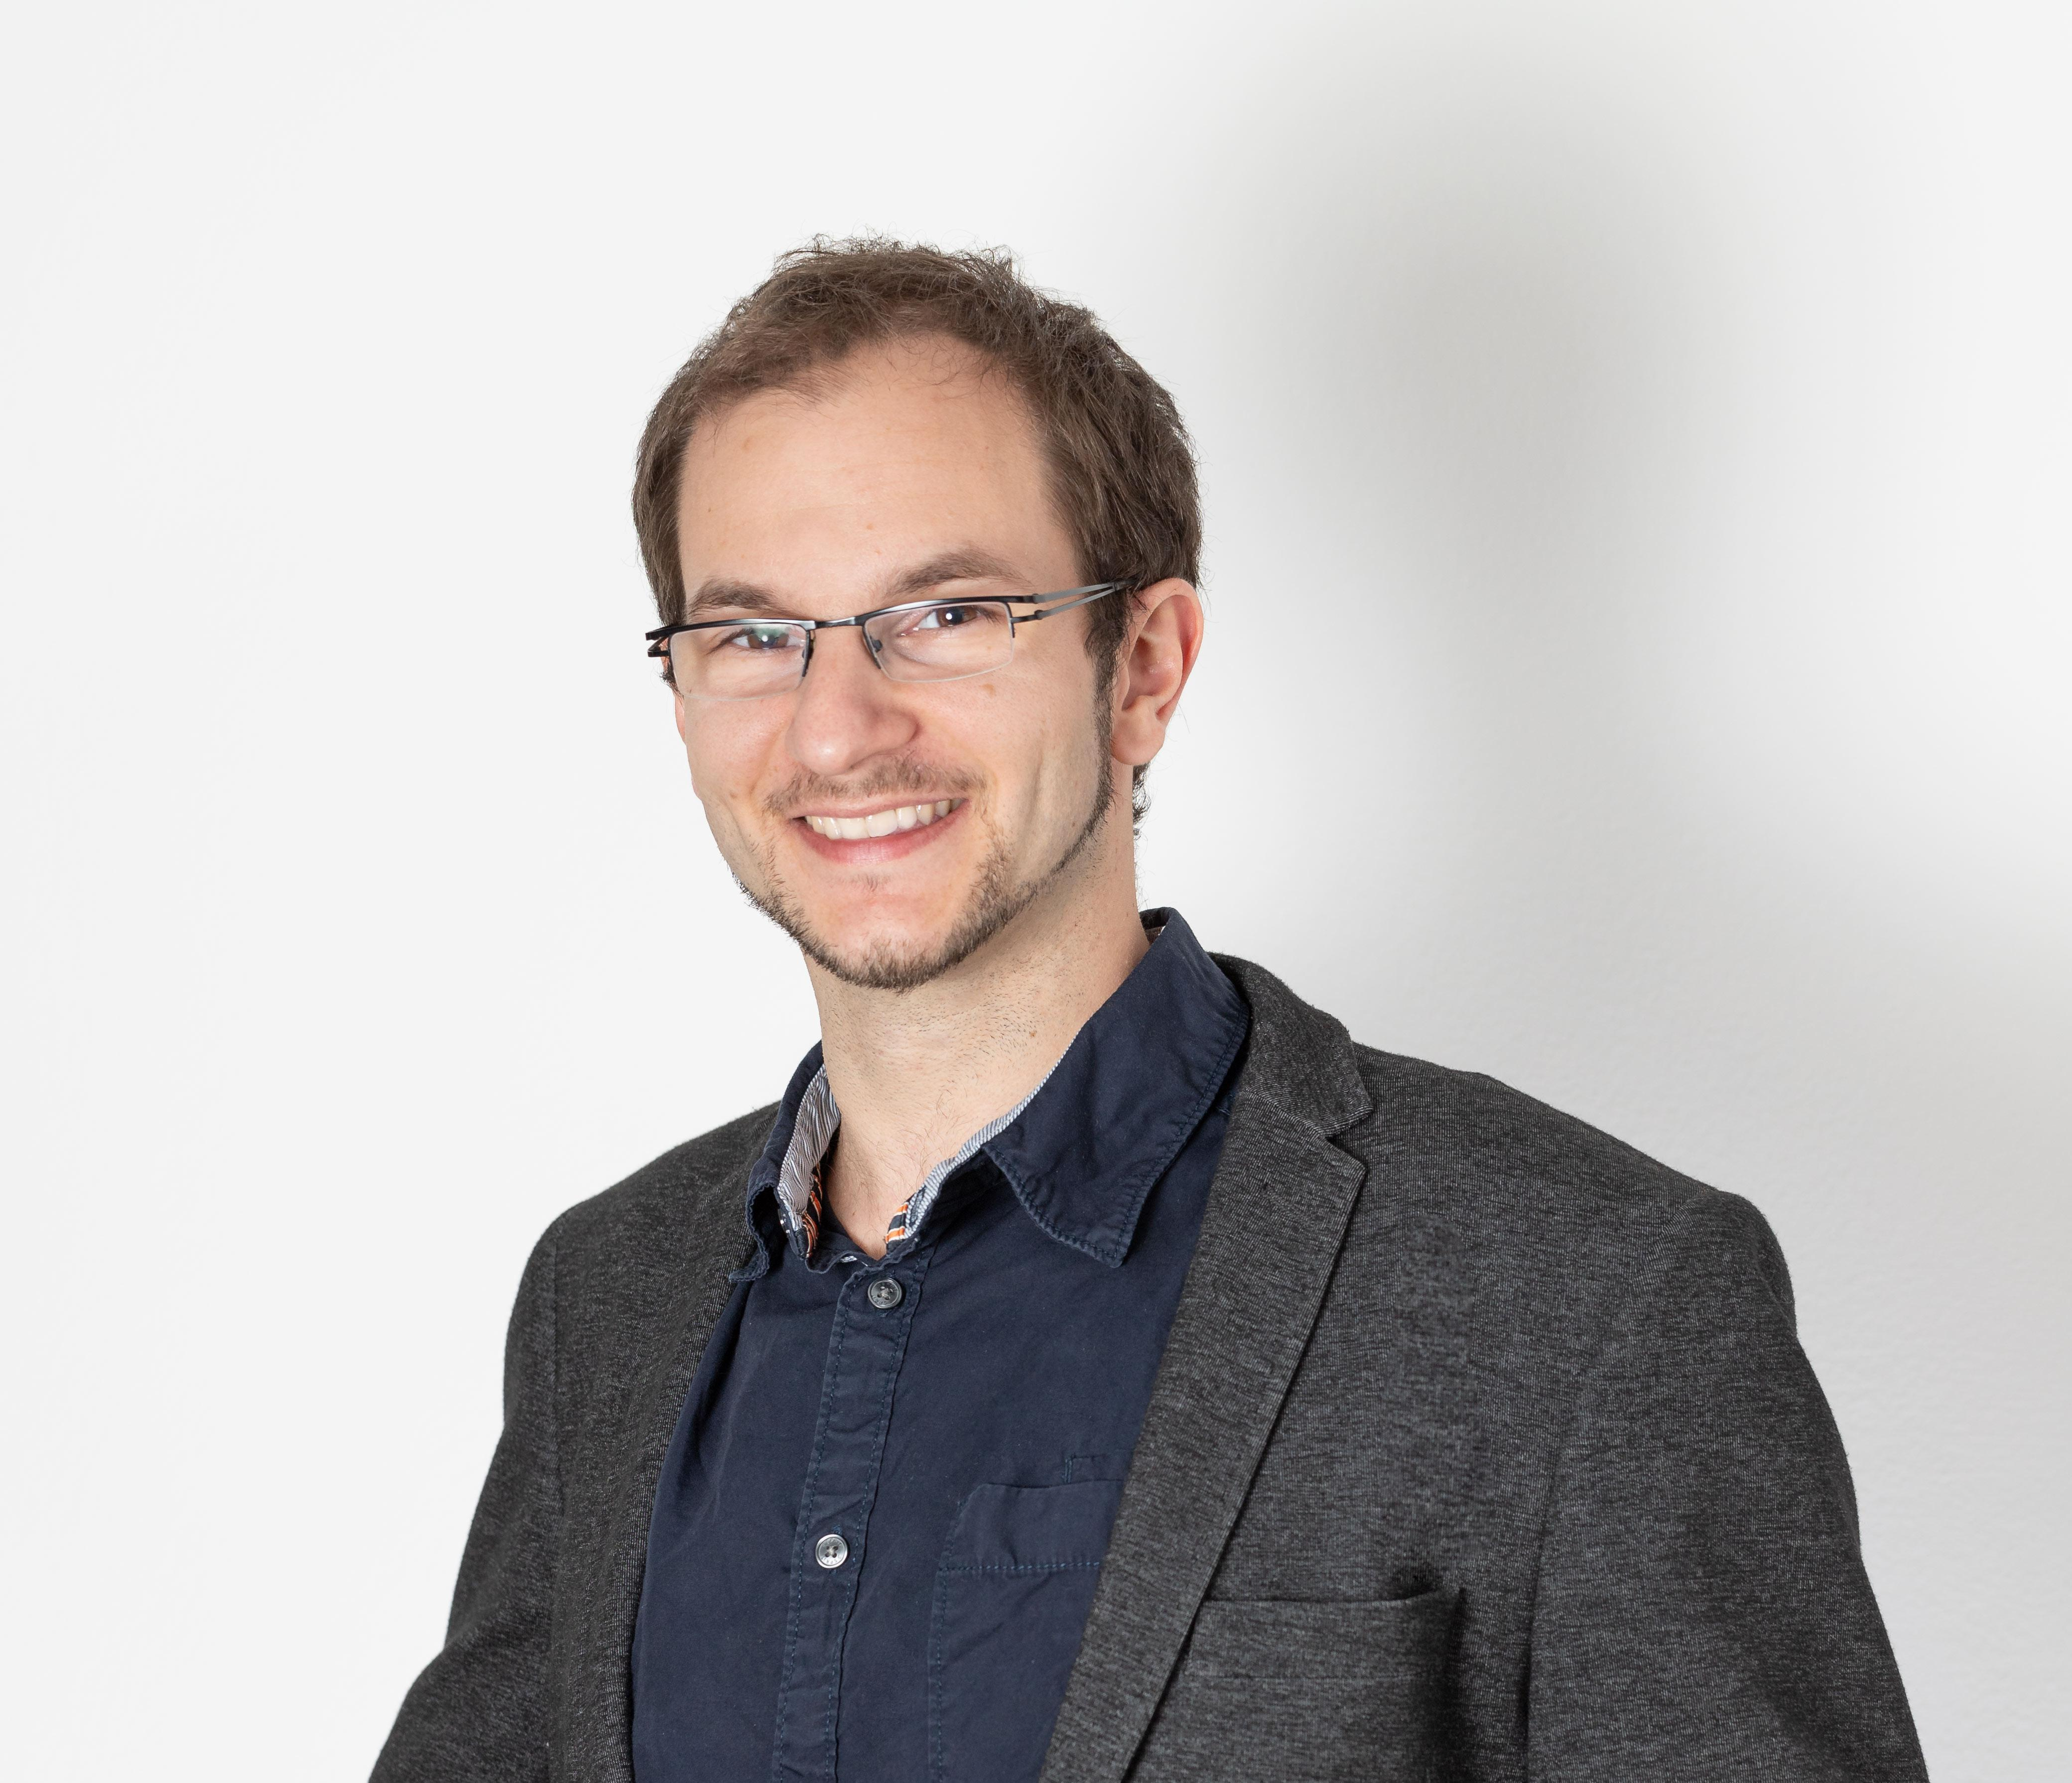 Christoph Adel